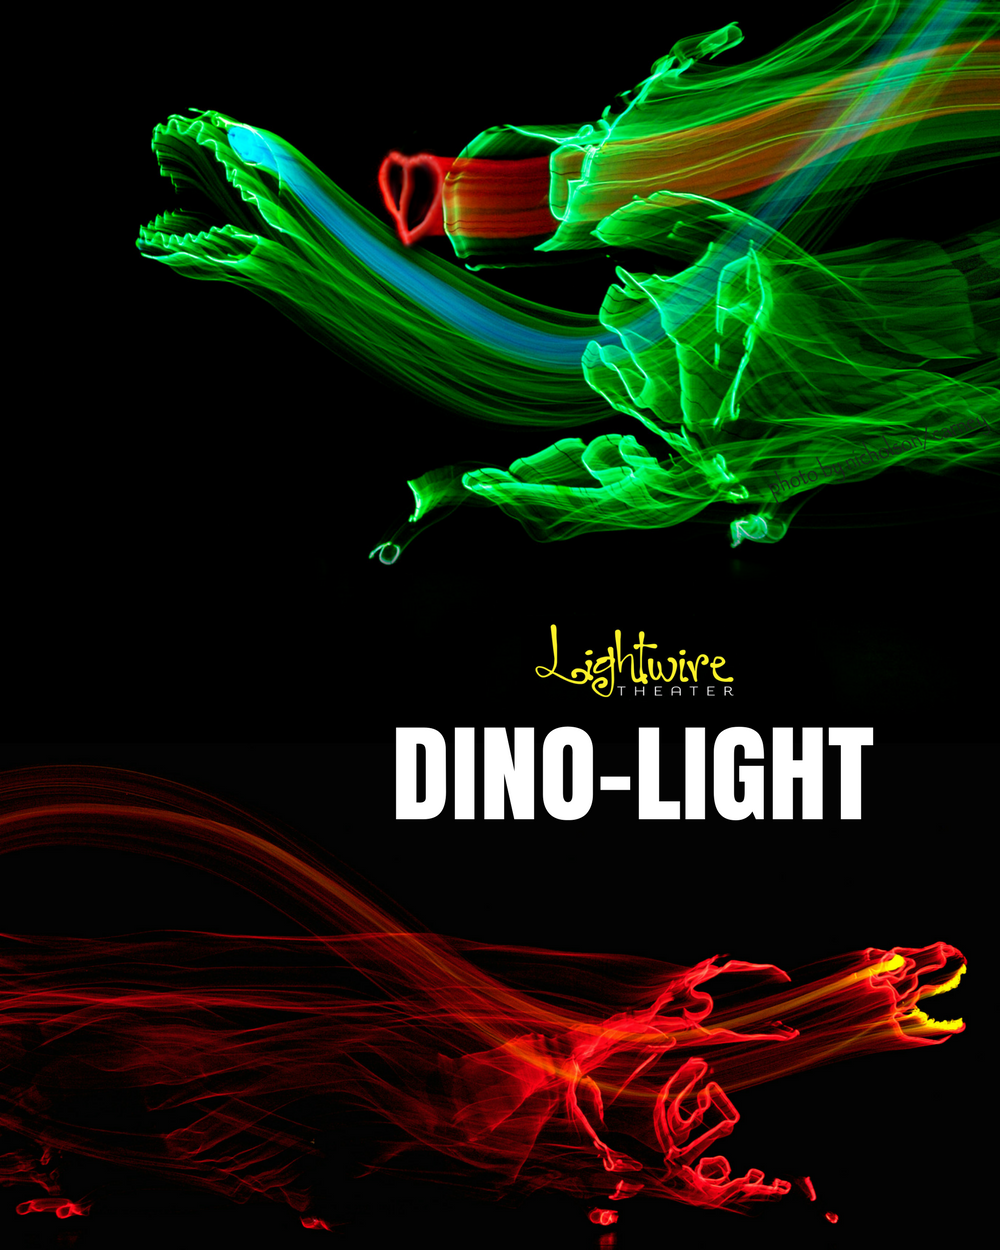 DINO-LIGHT